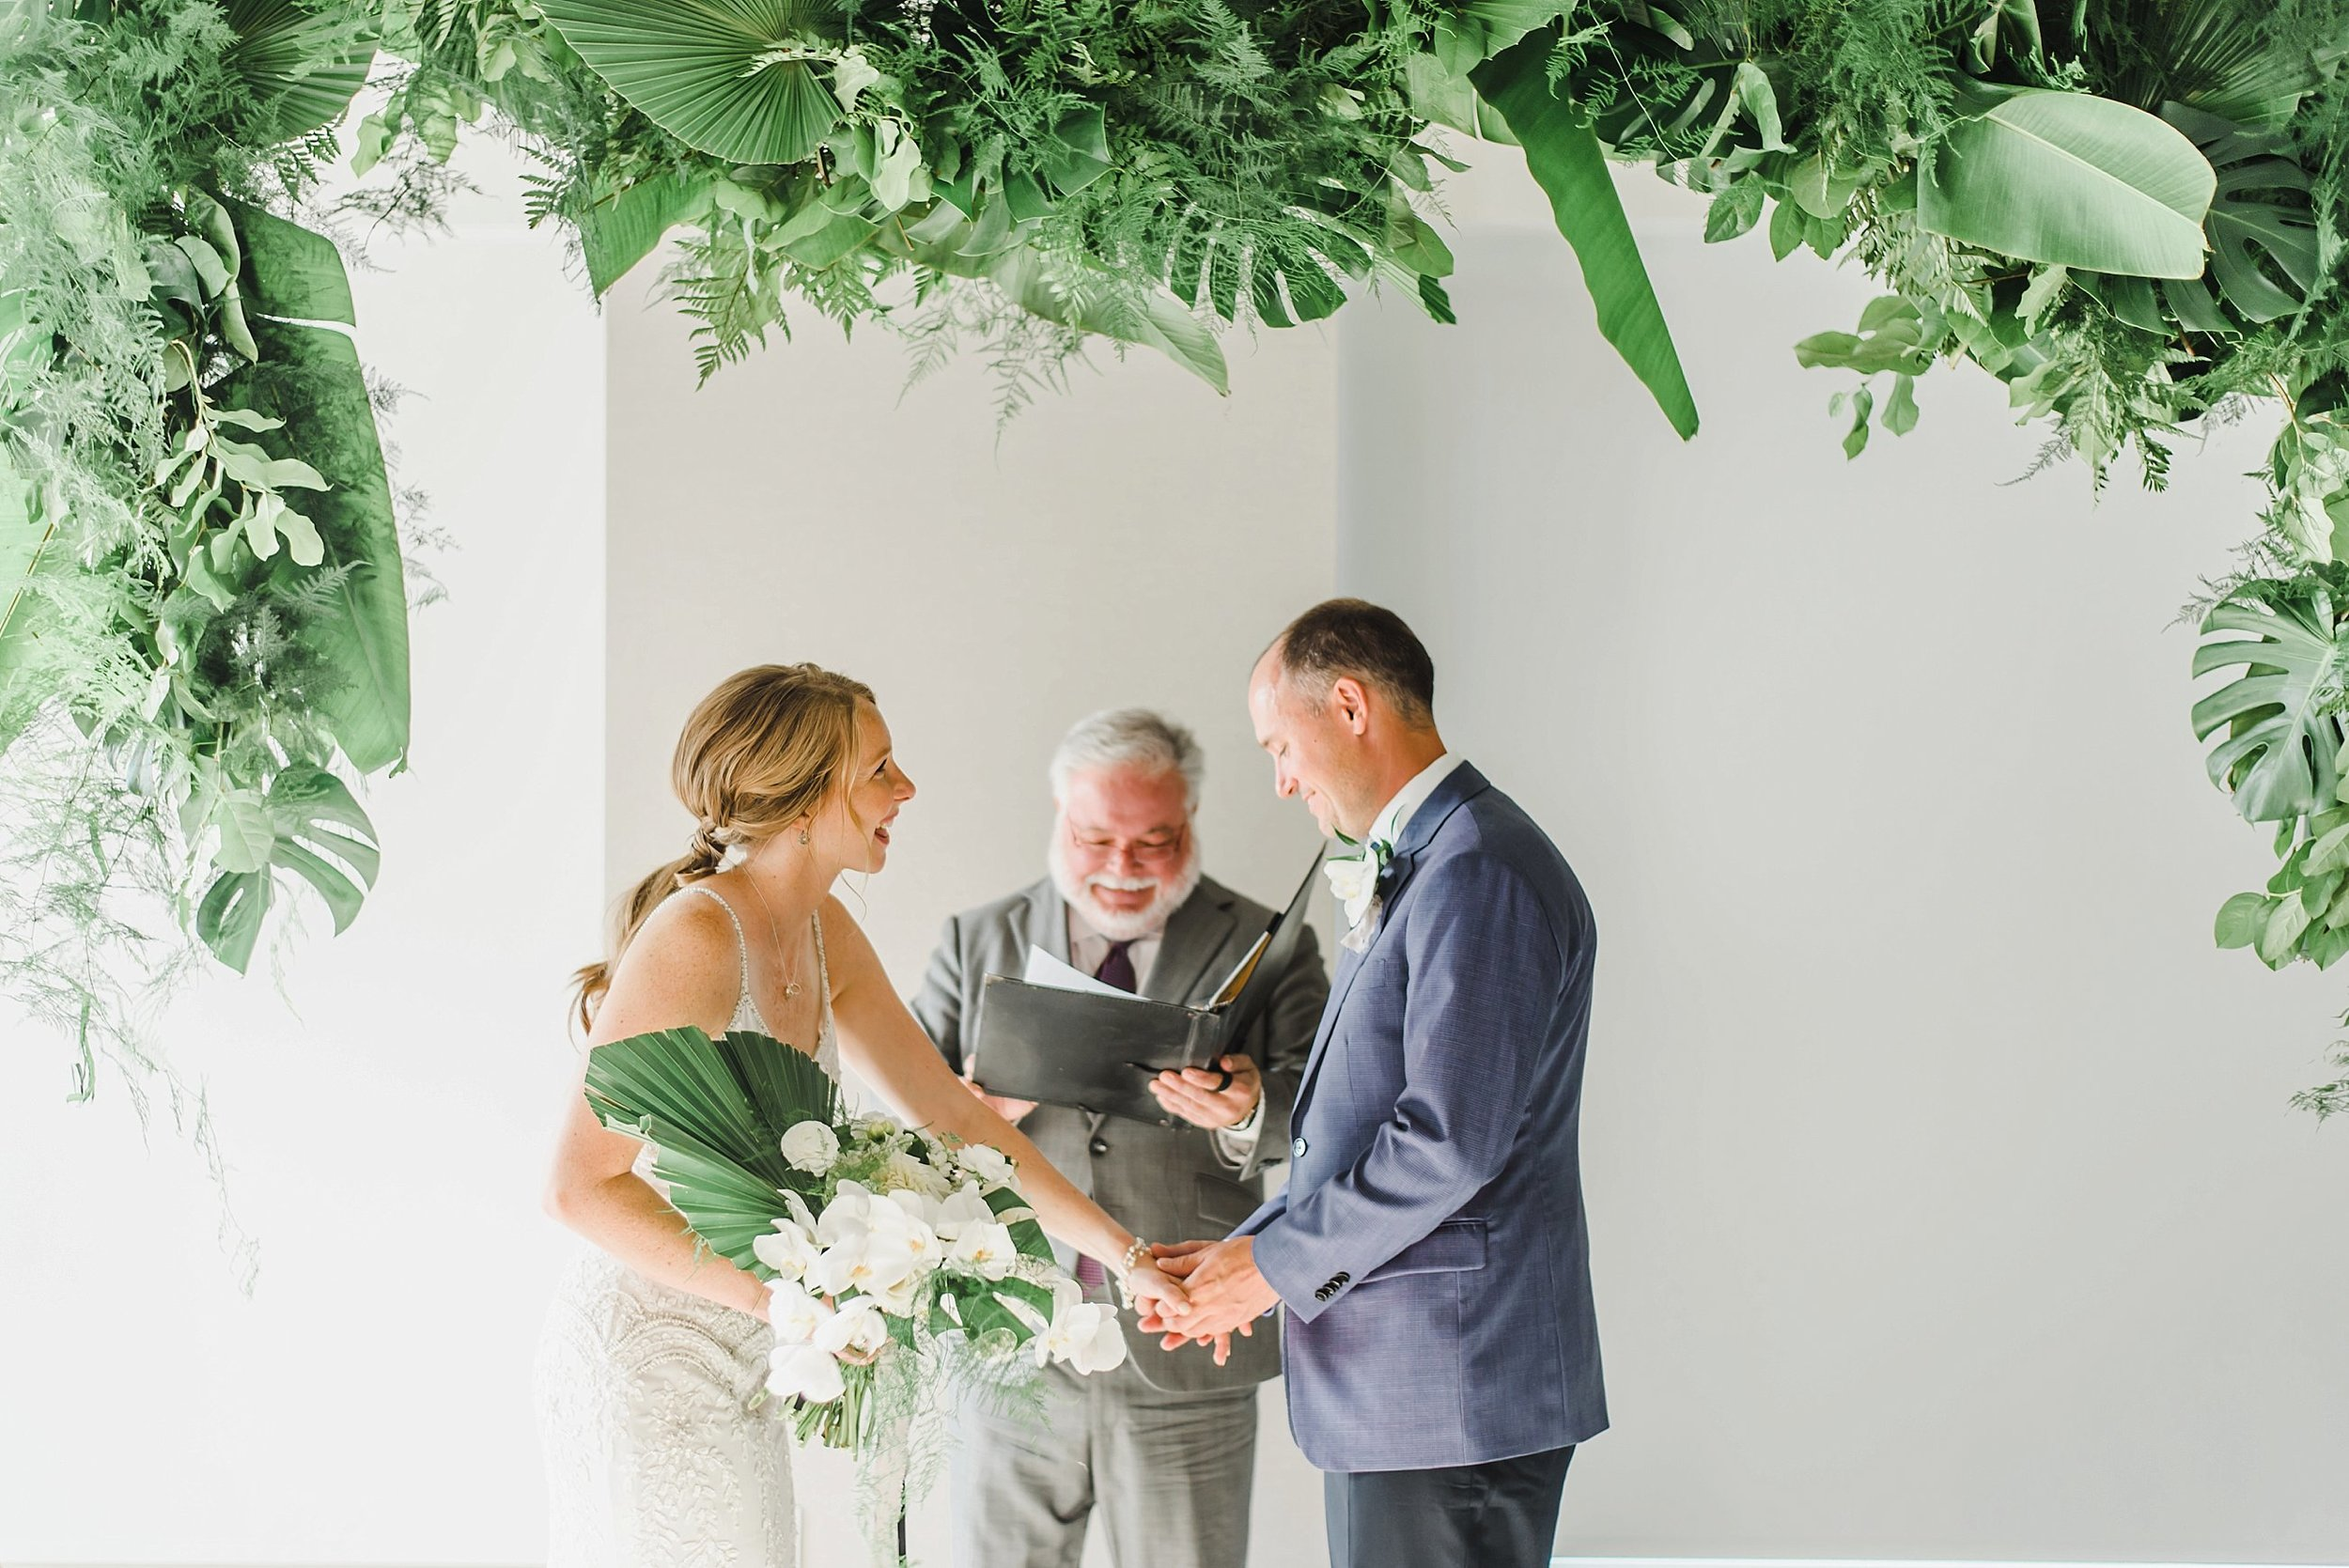 light airy indie fine art ottawa wedding photographer | Ali and Batoul Photography_0680.jpg